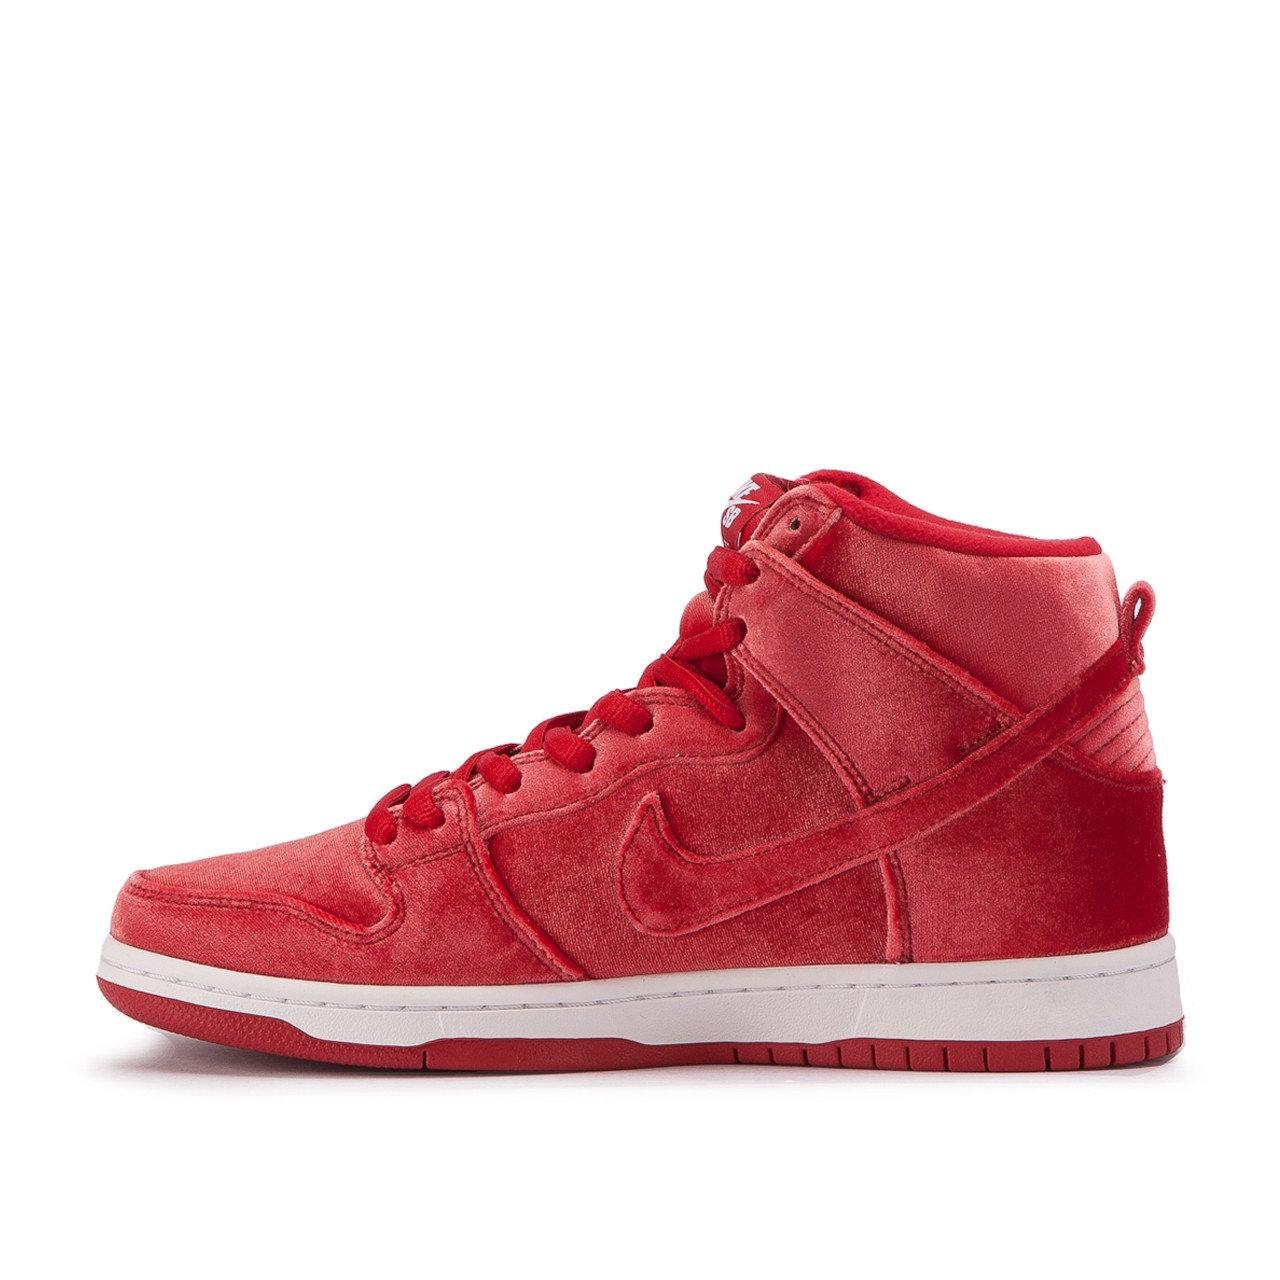 new product 870d6 f68a2 Nike SB Dunk High Premium 'Red Velvet'